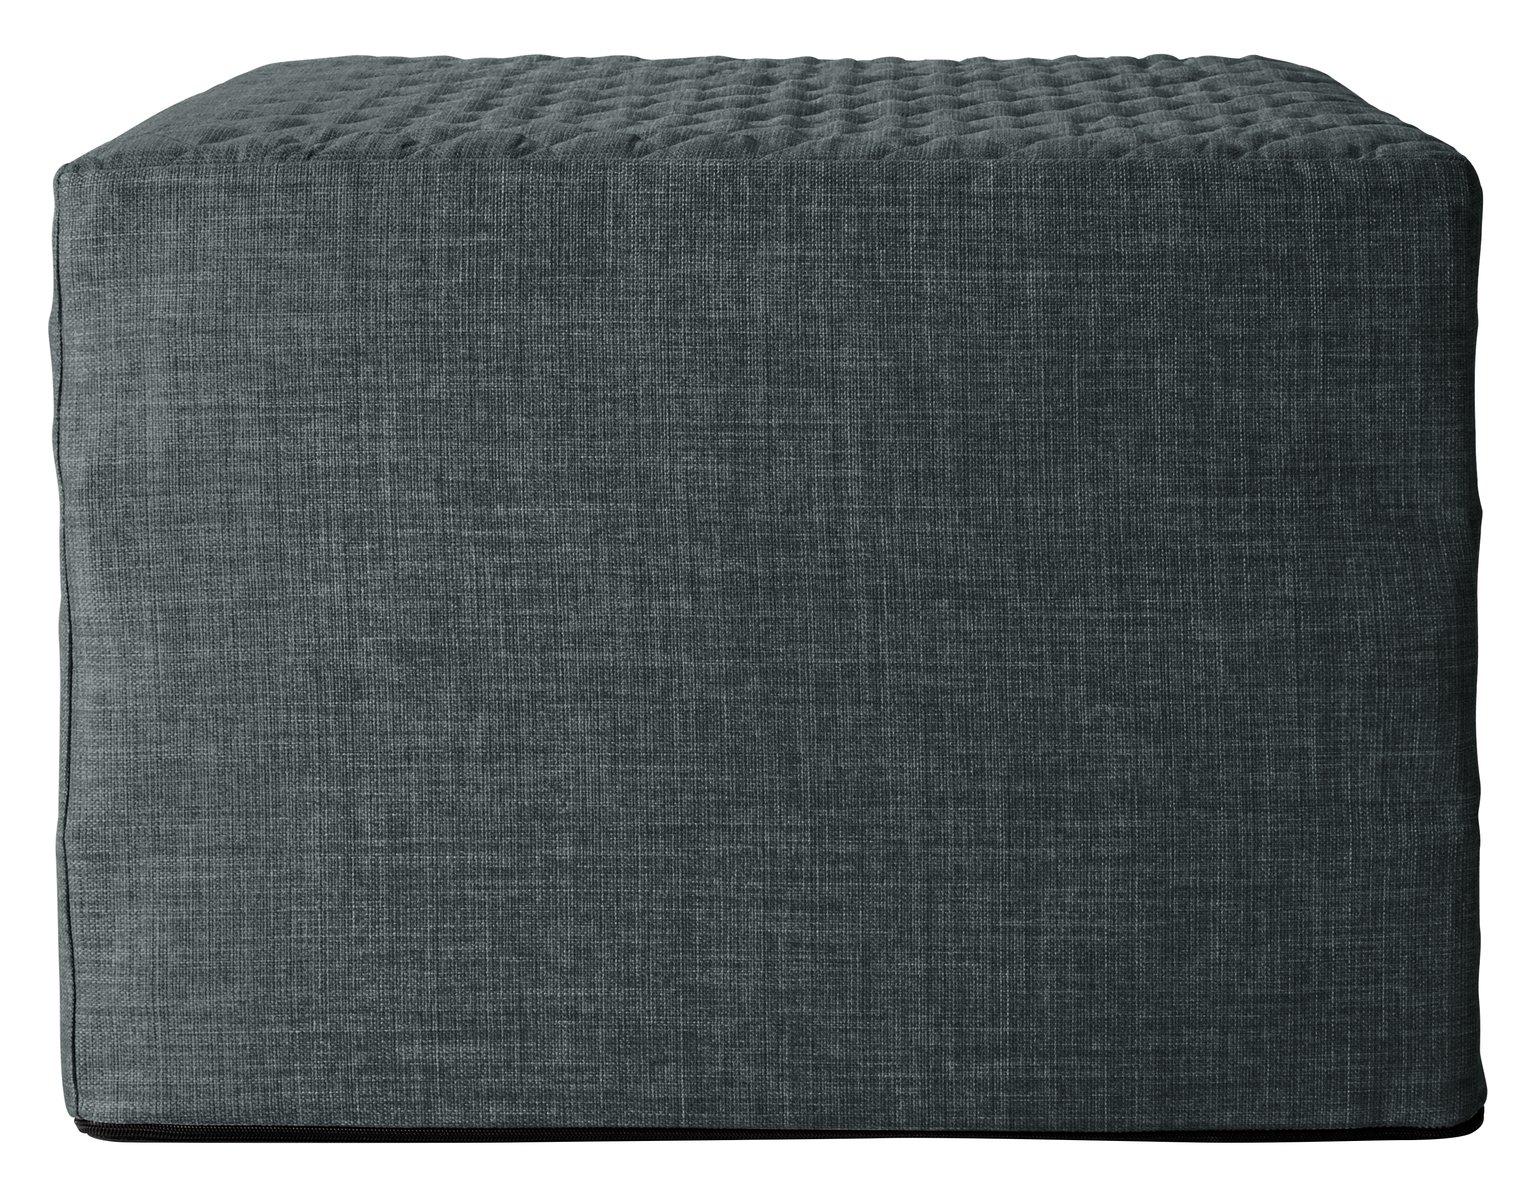 Argos Home Prim Fabric Single Ottoman Bed - Charcoal at Argos